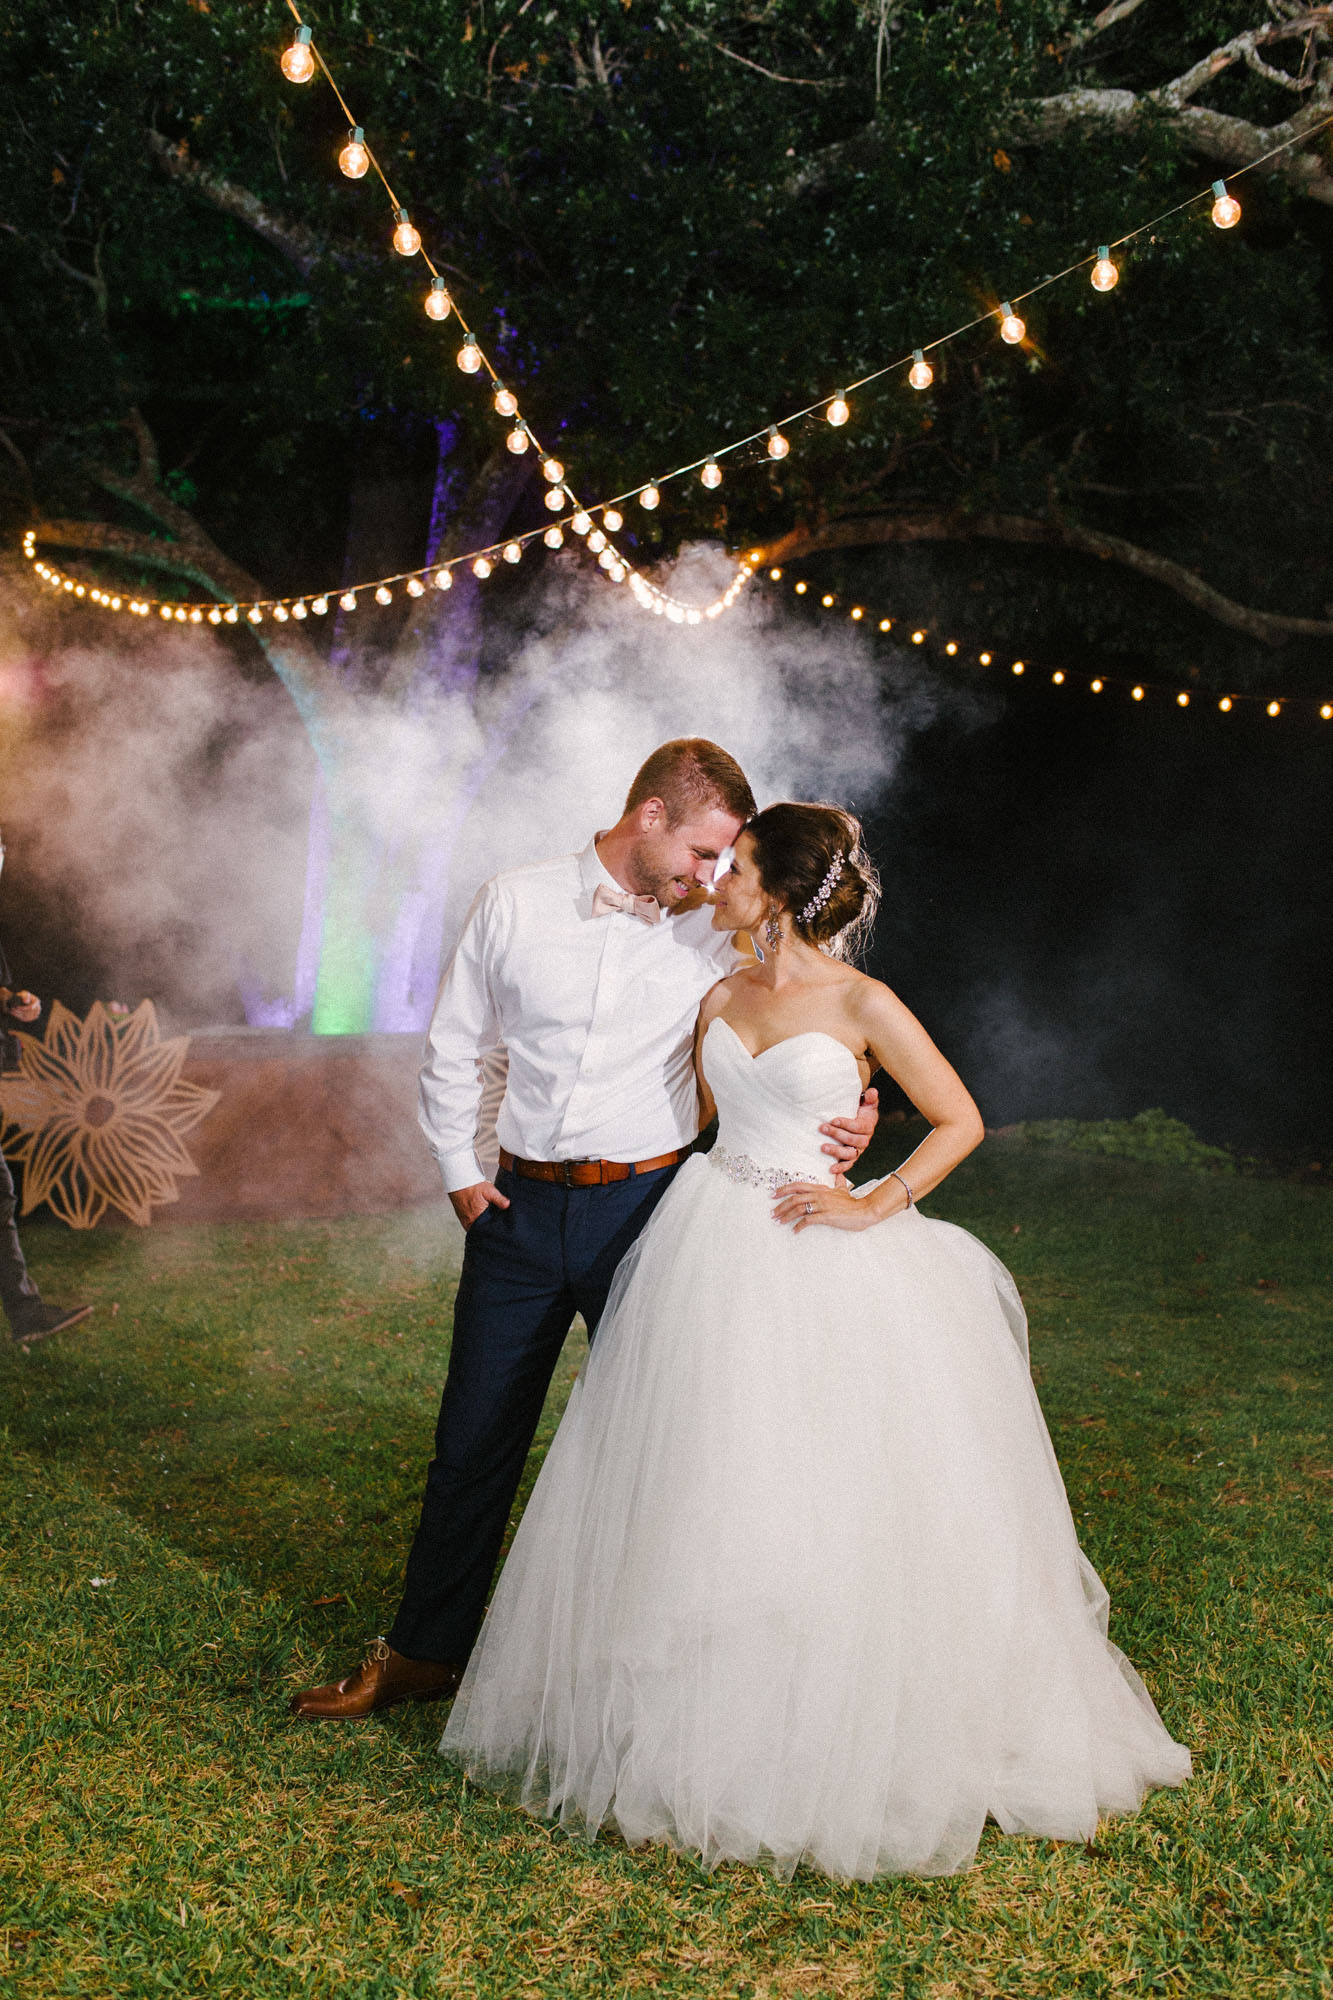 SM anna smith photography wedding photographer venue wedding planner-979.jpg